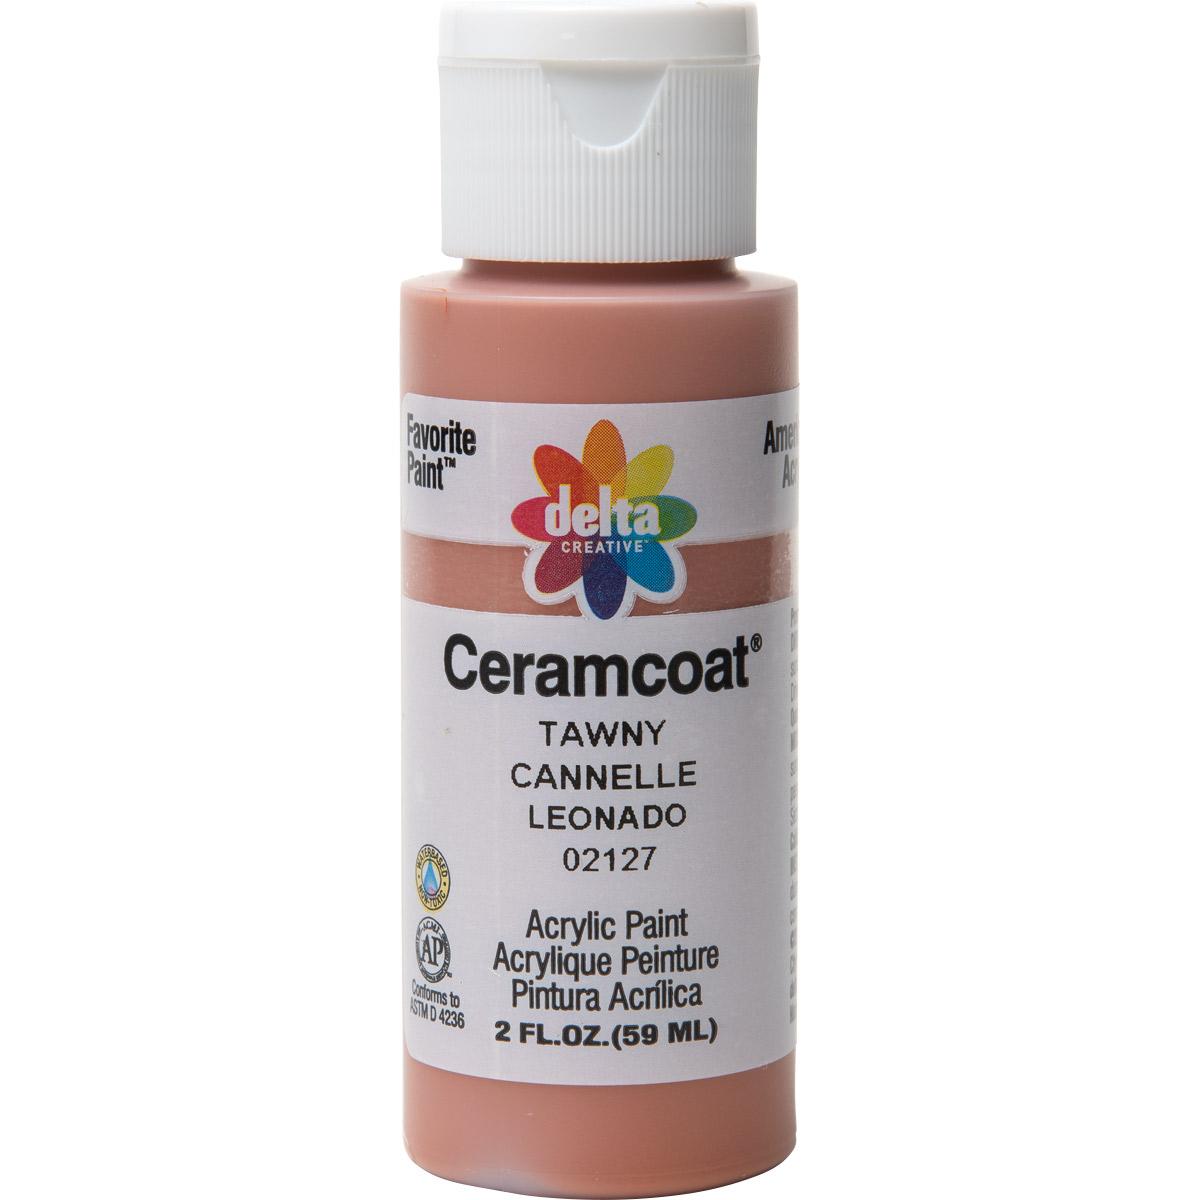 Delta Ceramcoat ® Acrylic Paint - Tawny, 2 oz.